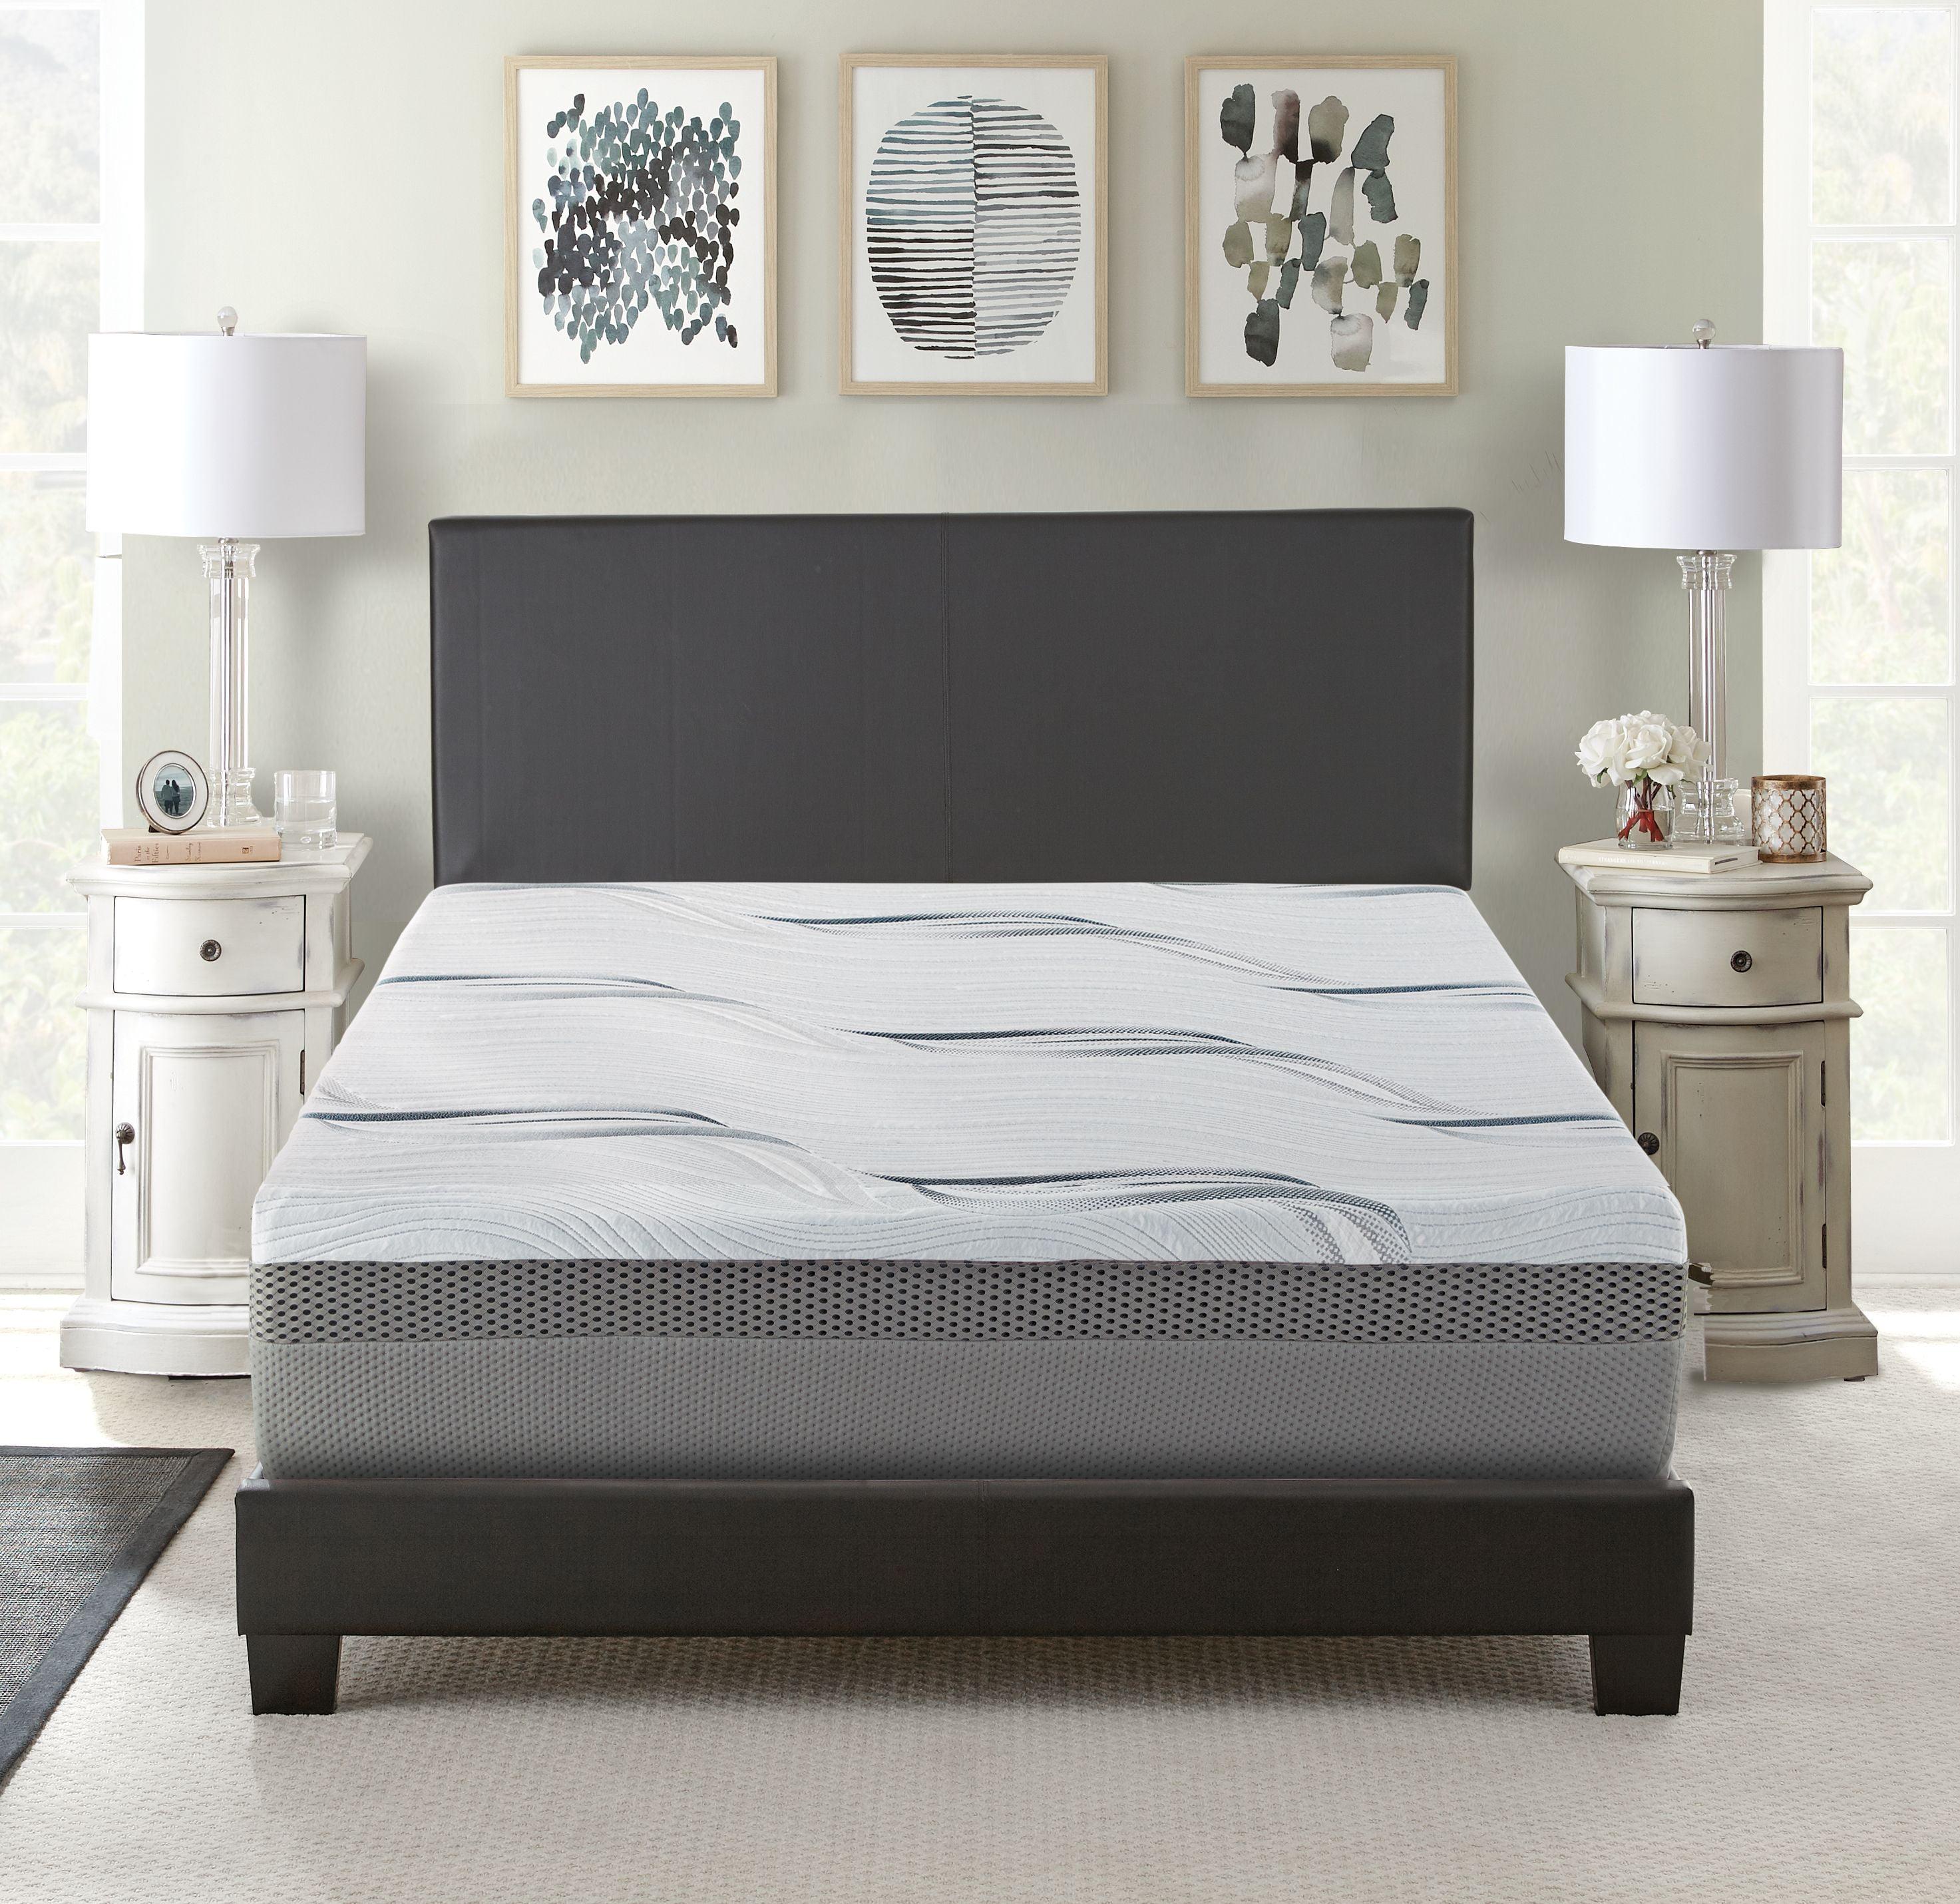 Contura III 12 Inch Medium Firm Memory Foam Mattress Bed